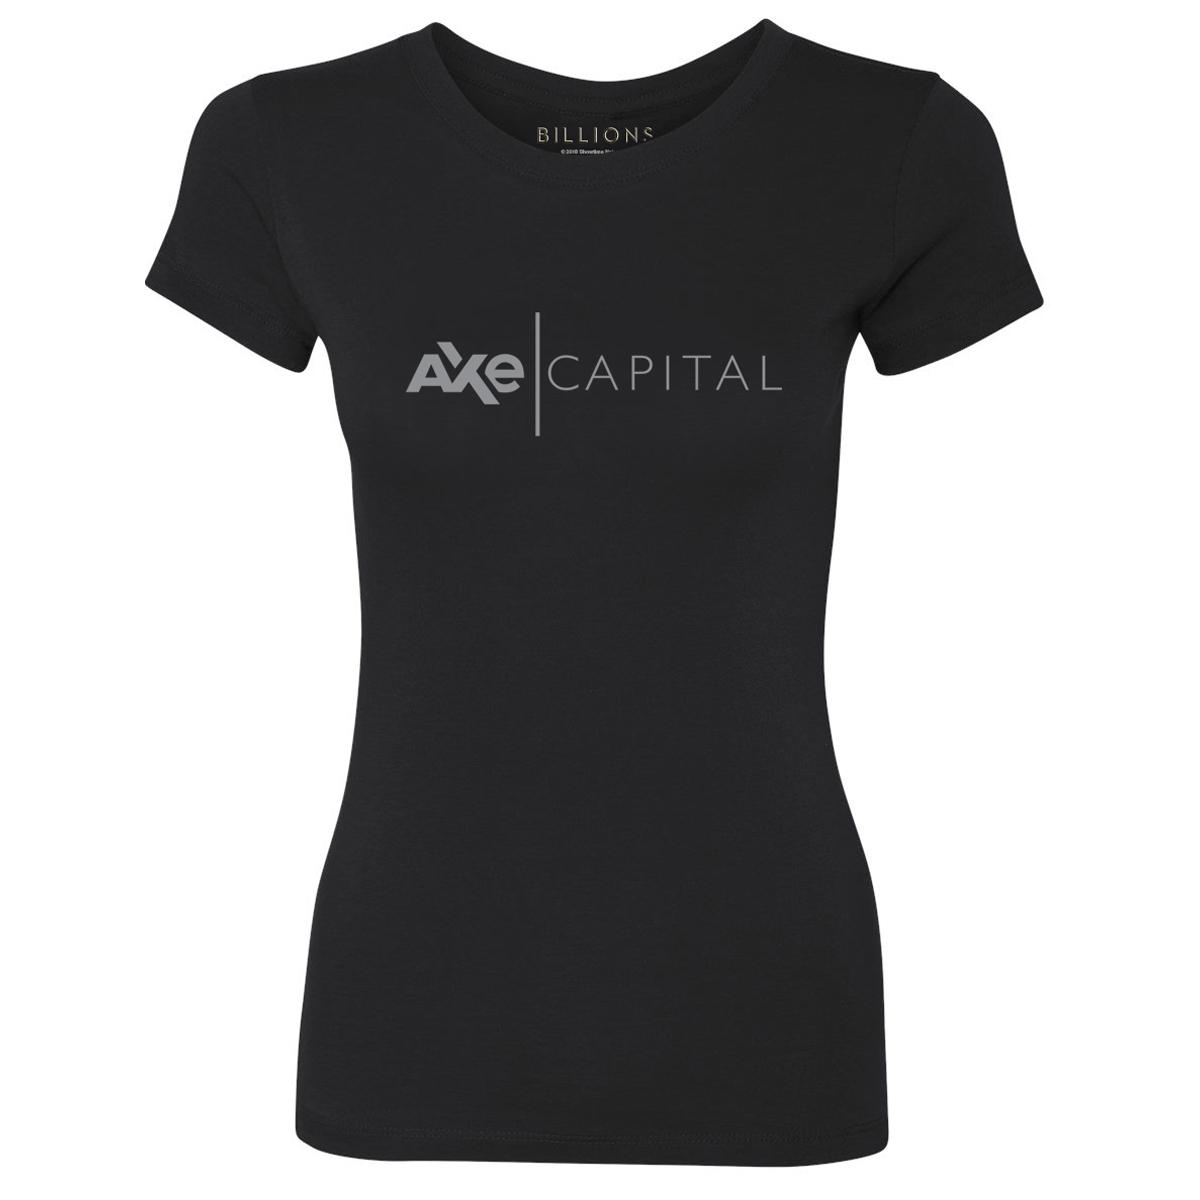 Billions Axe Capital Women's Slim Fit T-Shirt (Black)